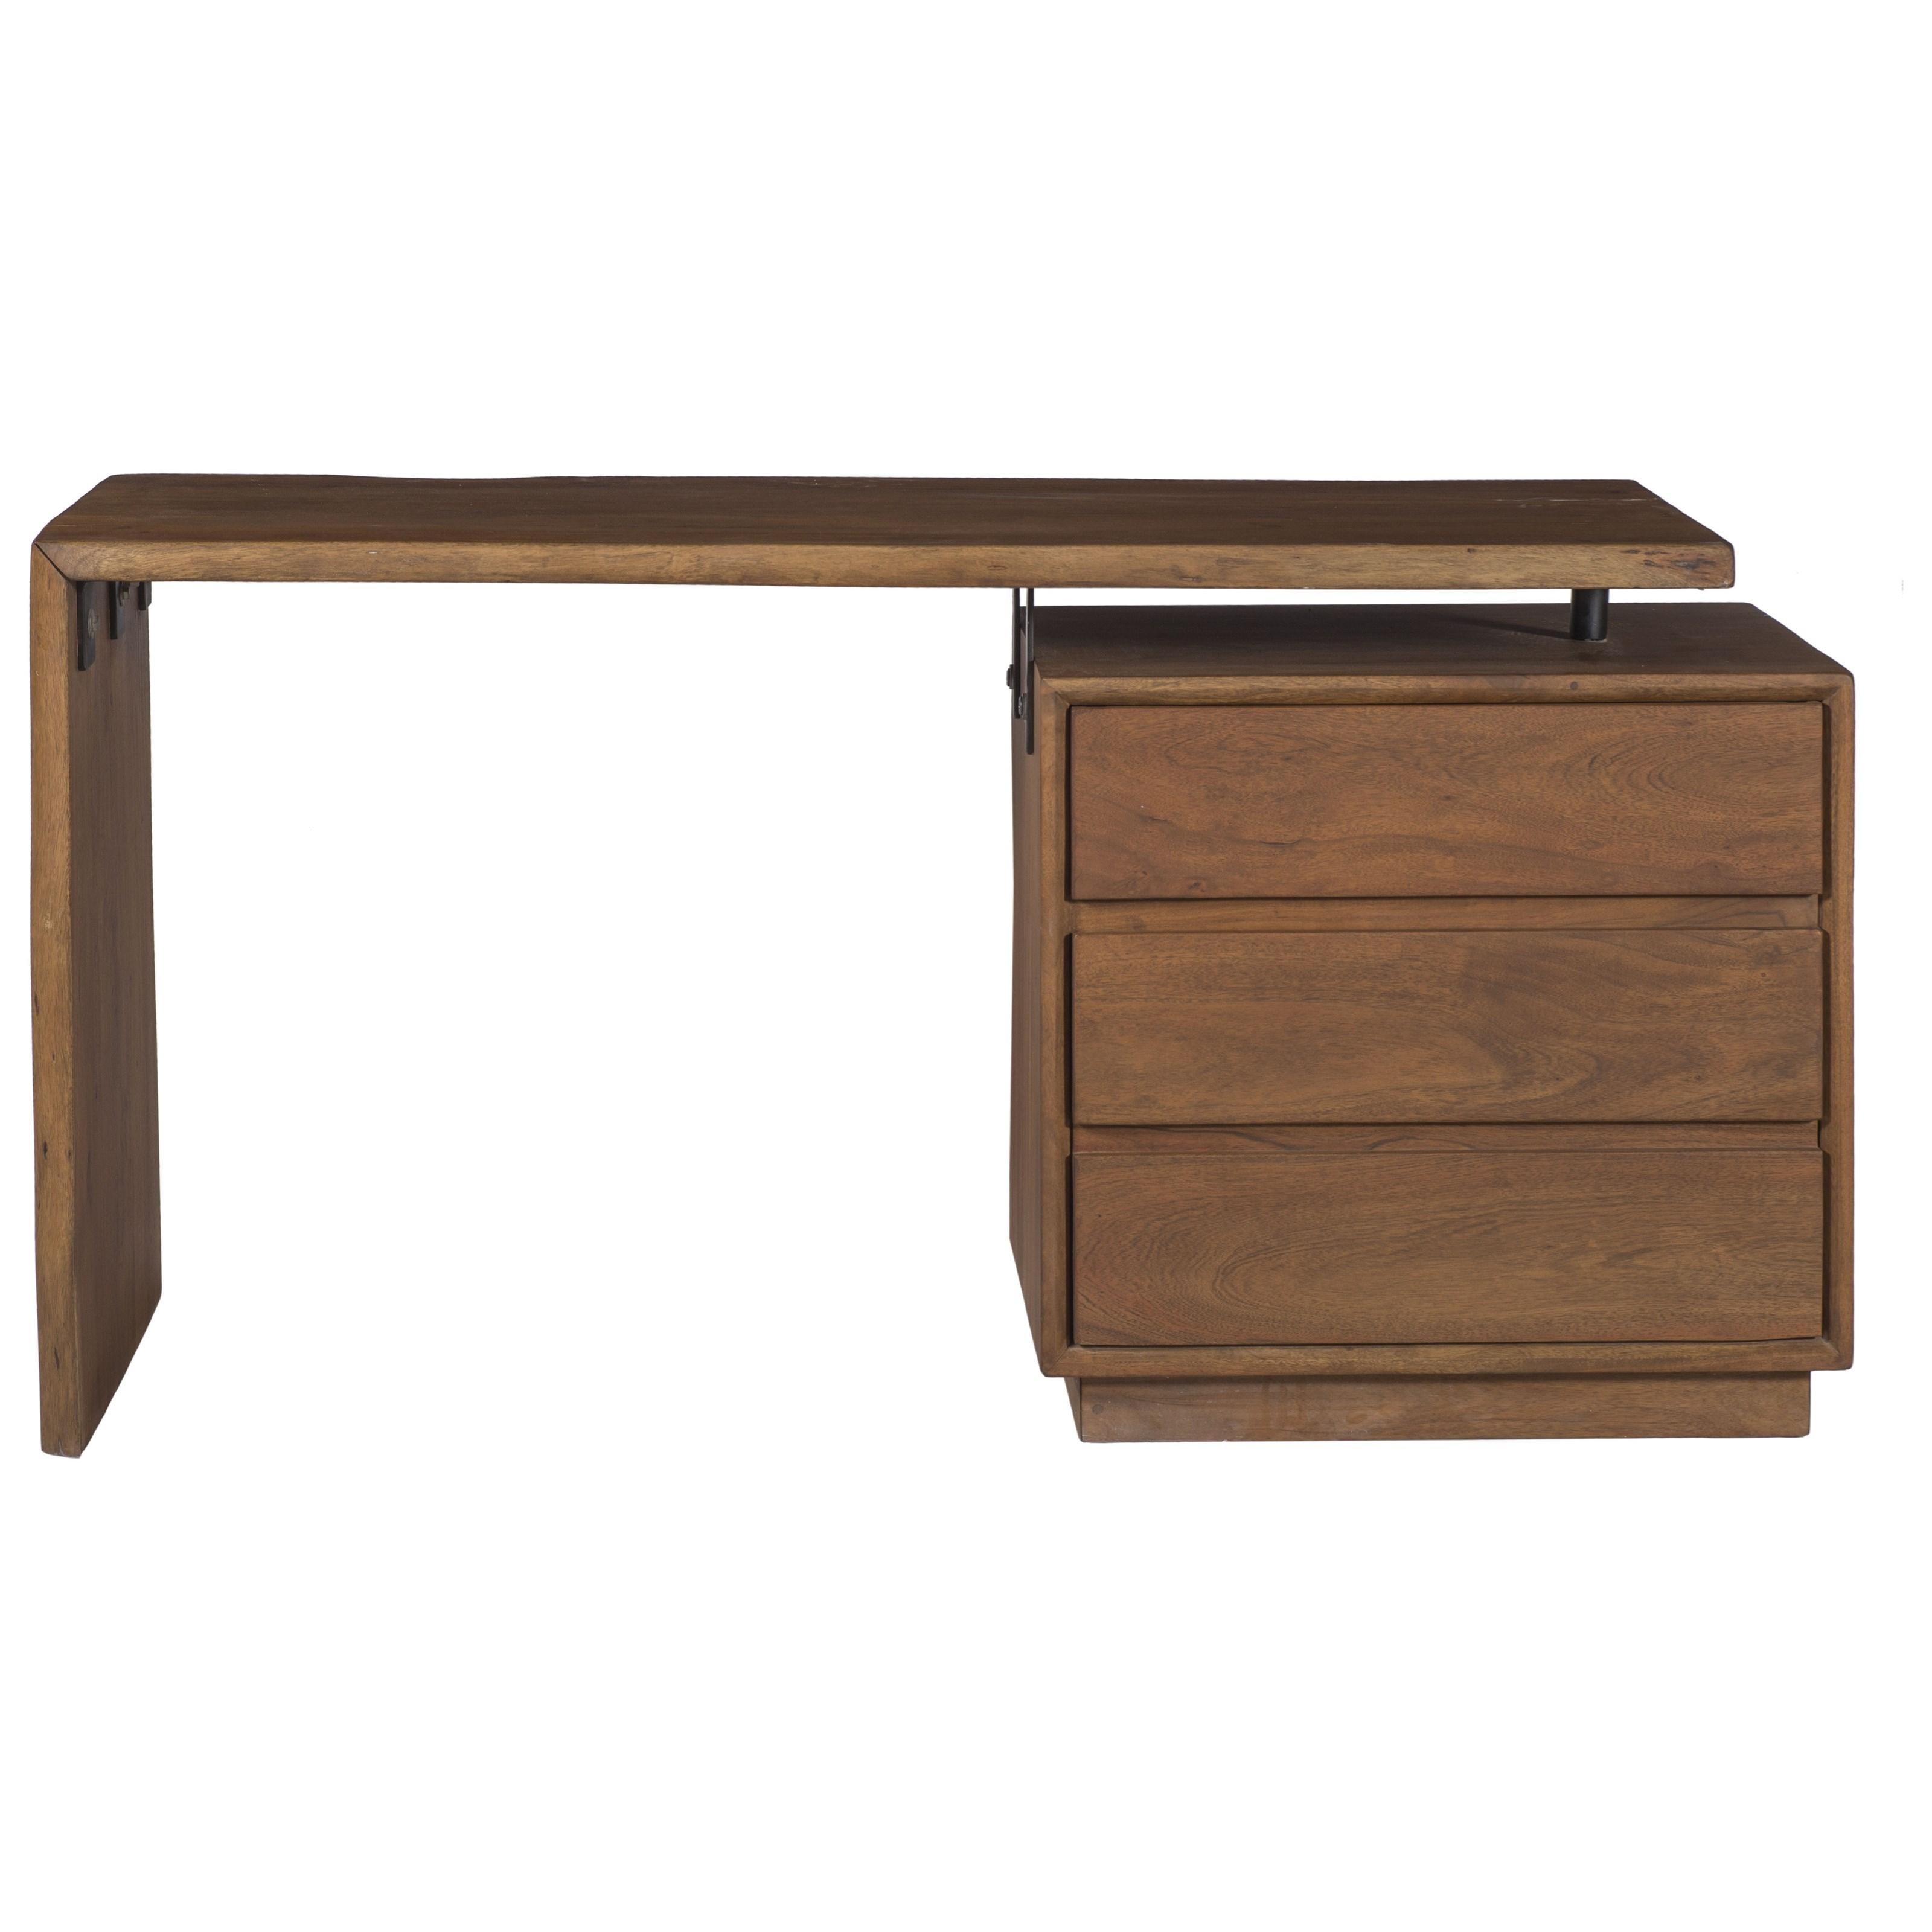 adjustable writing desk Shop wayfair for all the best height adjustable & standing desks enjoy free shipping on most stuff, even big stuff.